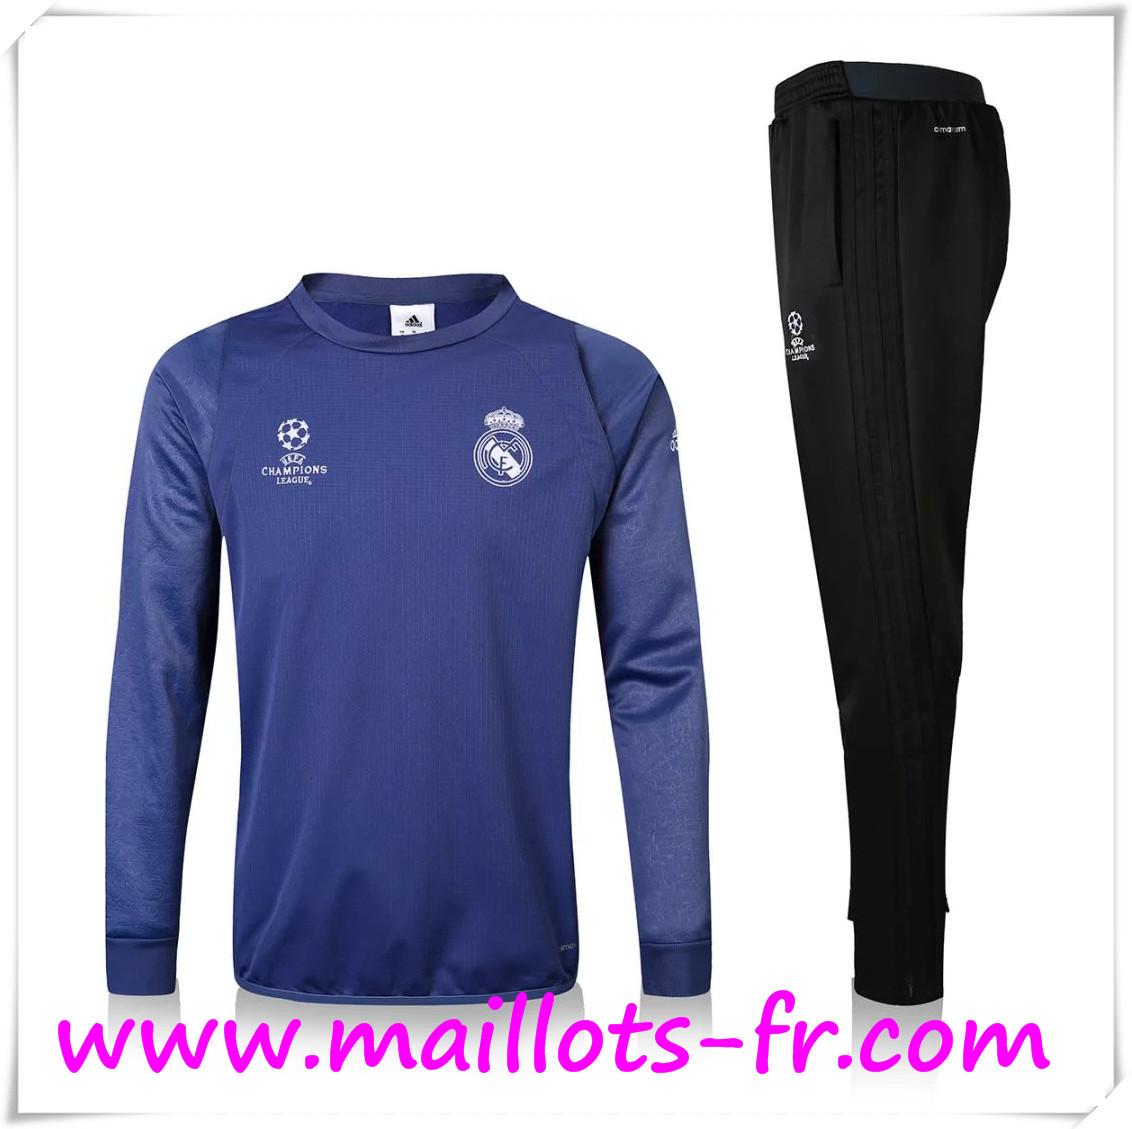 Survetement Real Madrid online